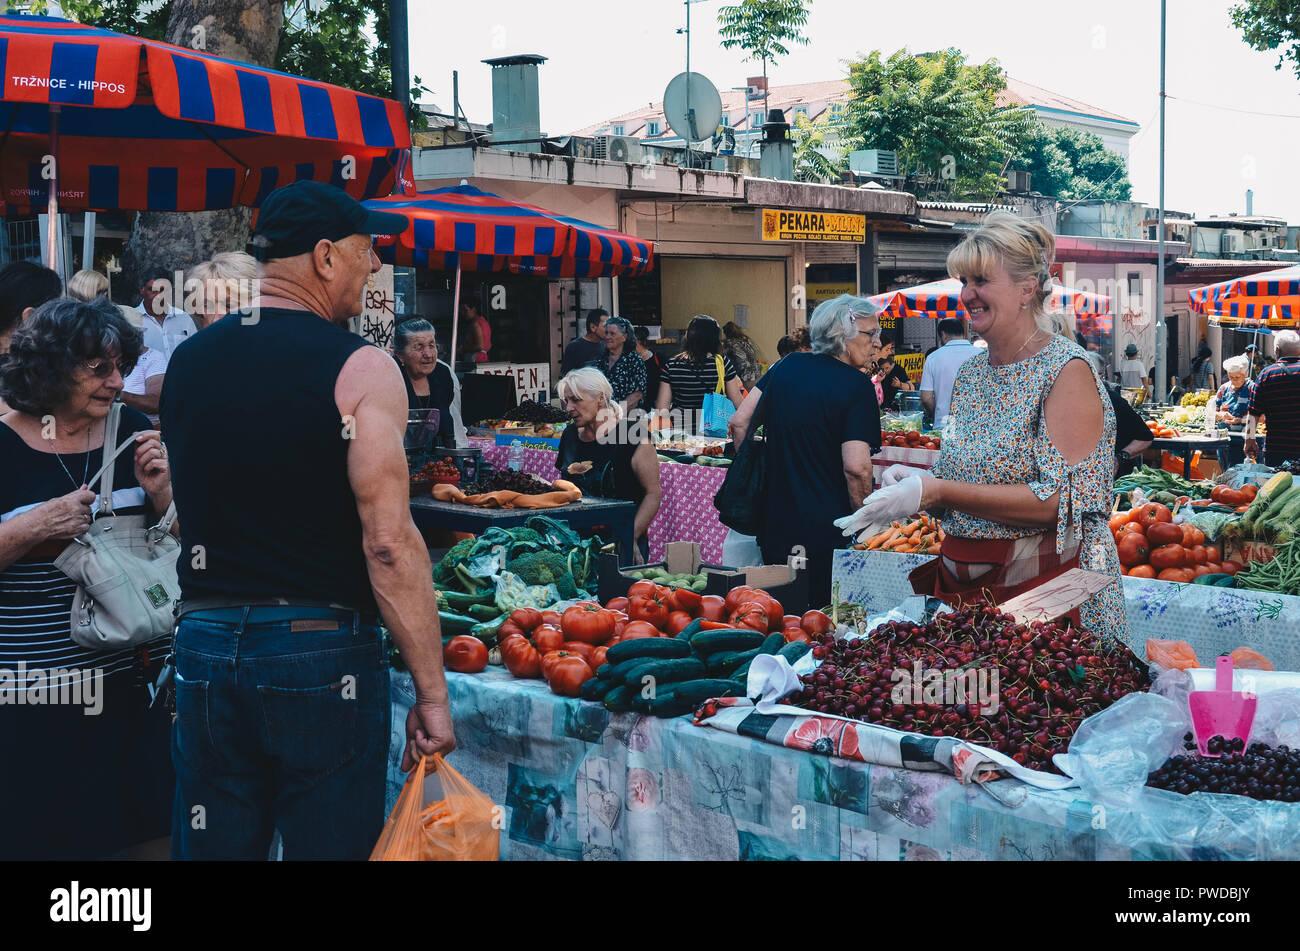 The outdoor market (Pazar), Split, Croatia, September 2018 Stock Photo